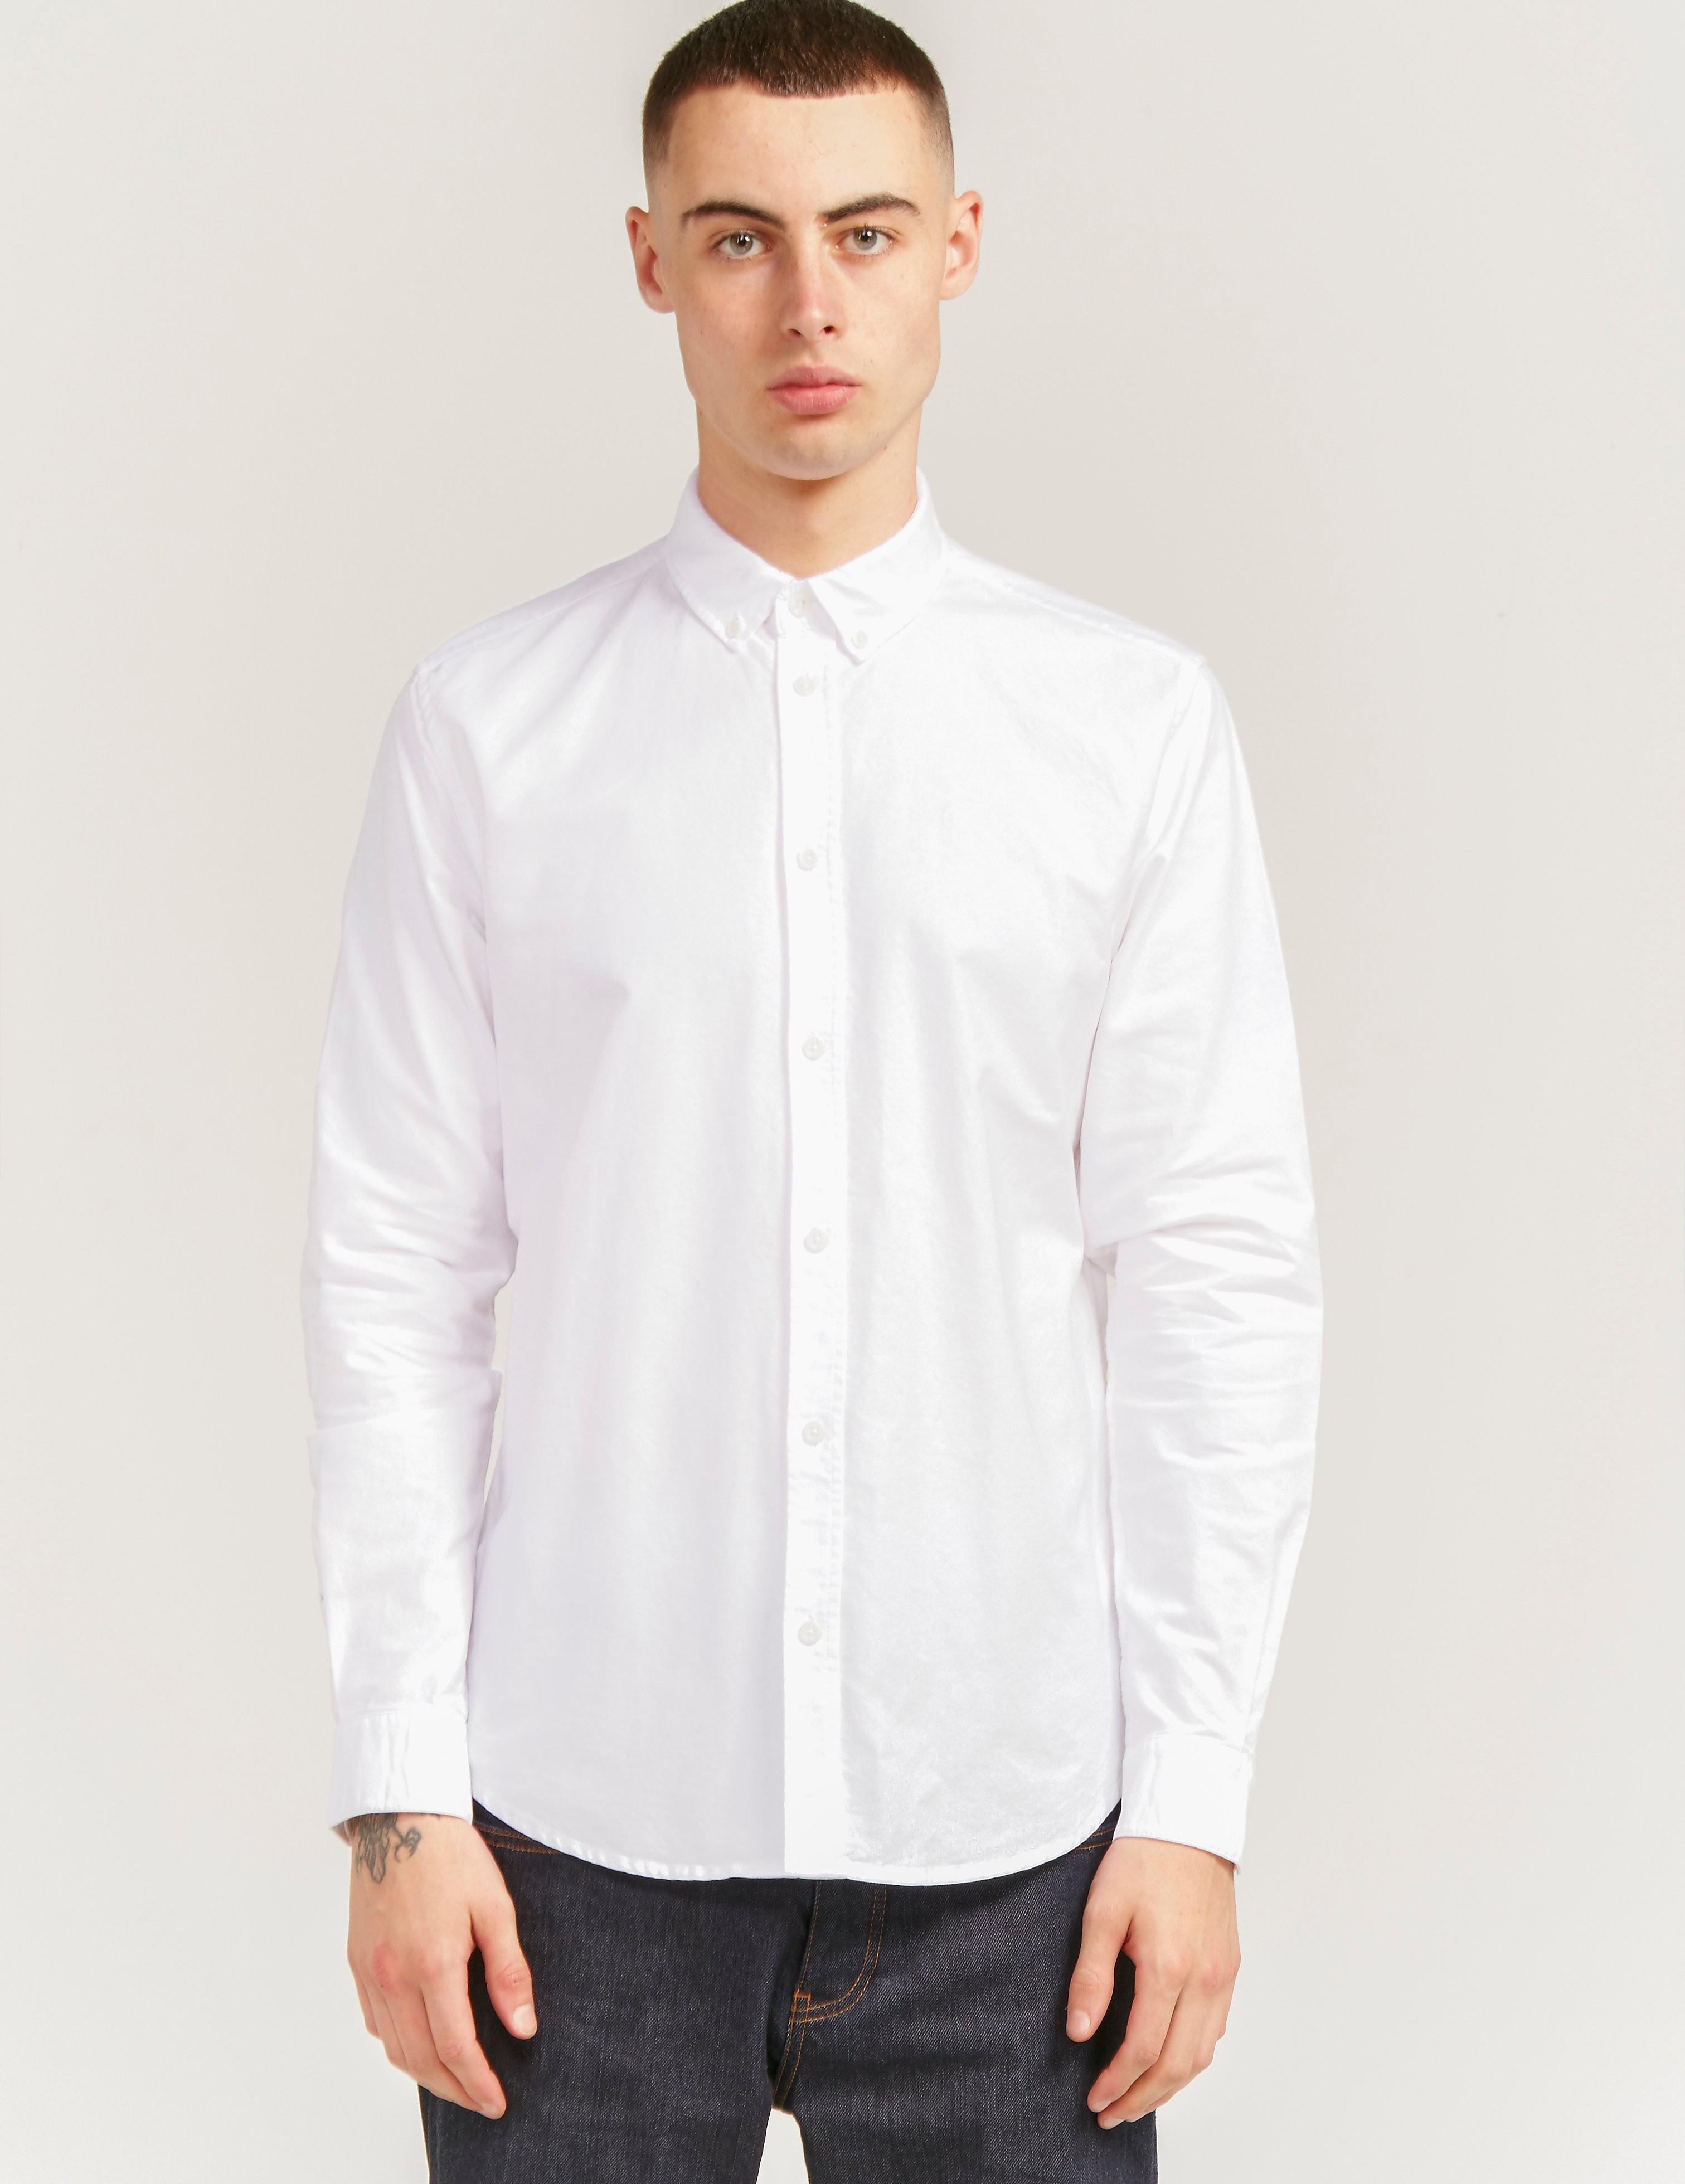 Samsoe & Samsoe Oxford shirt